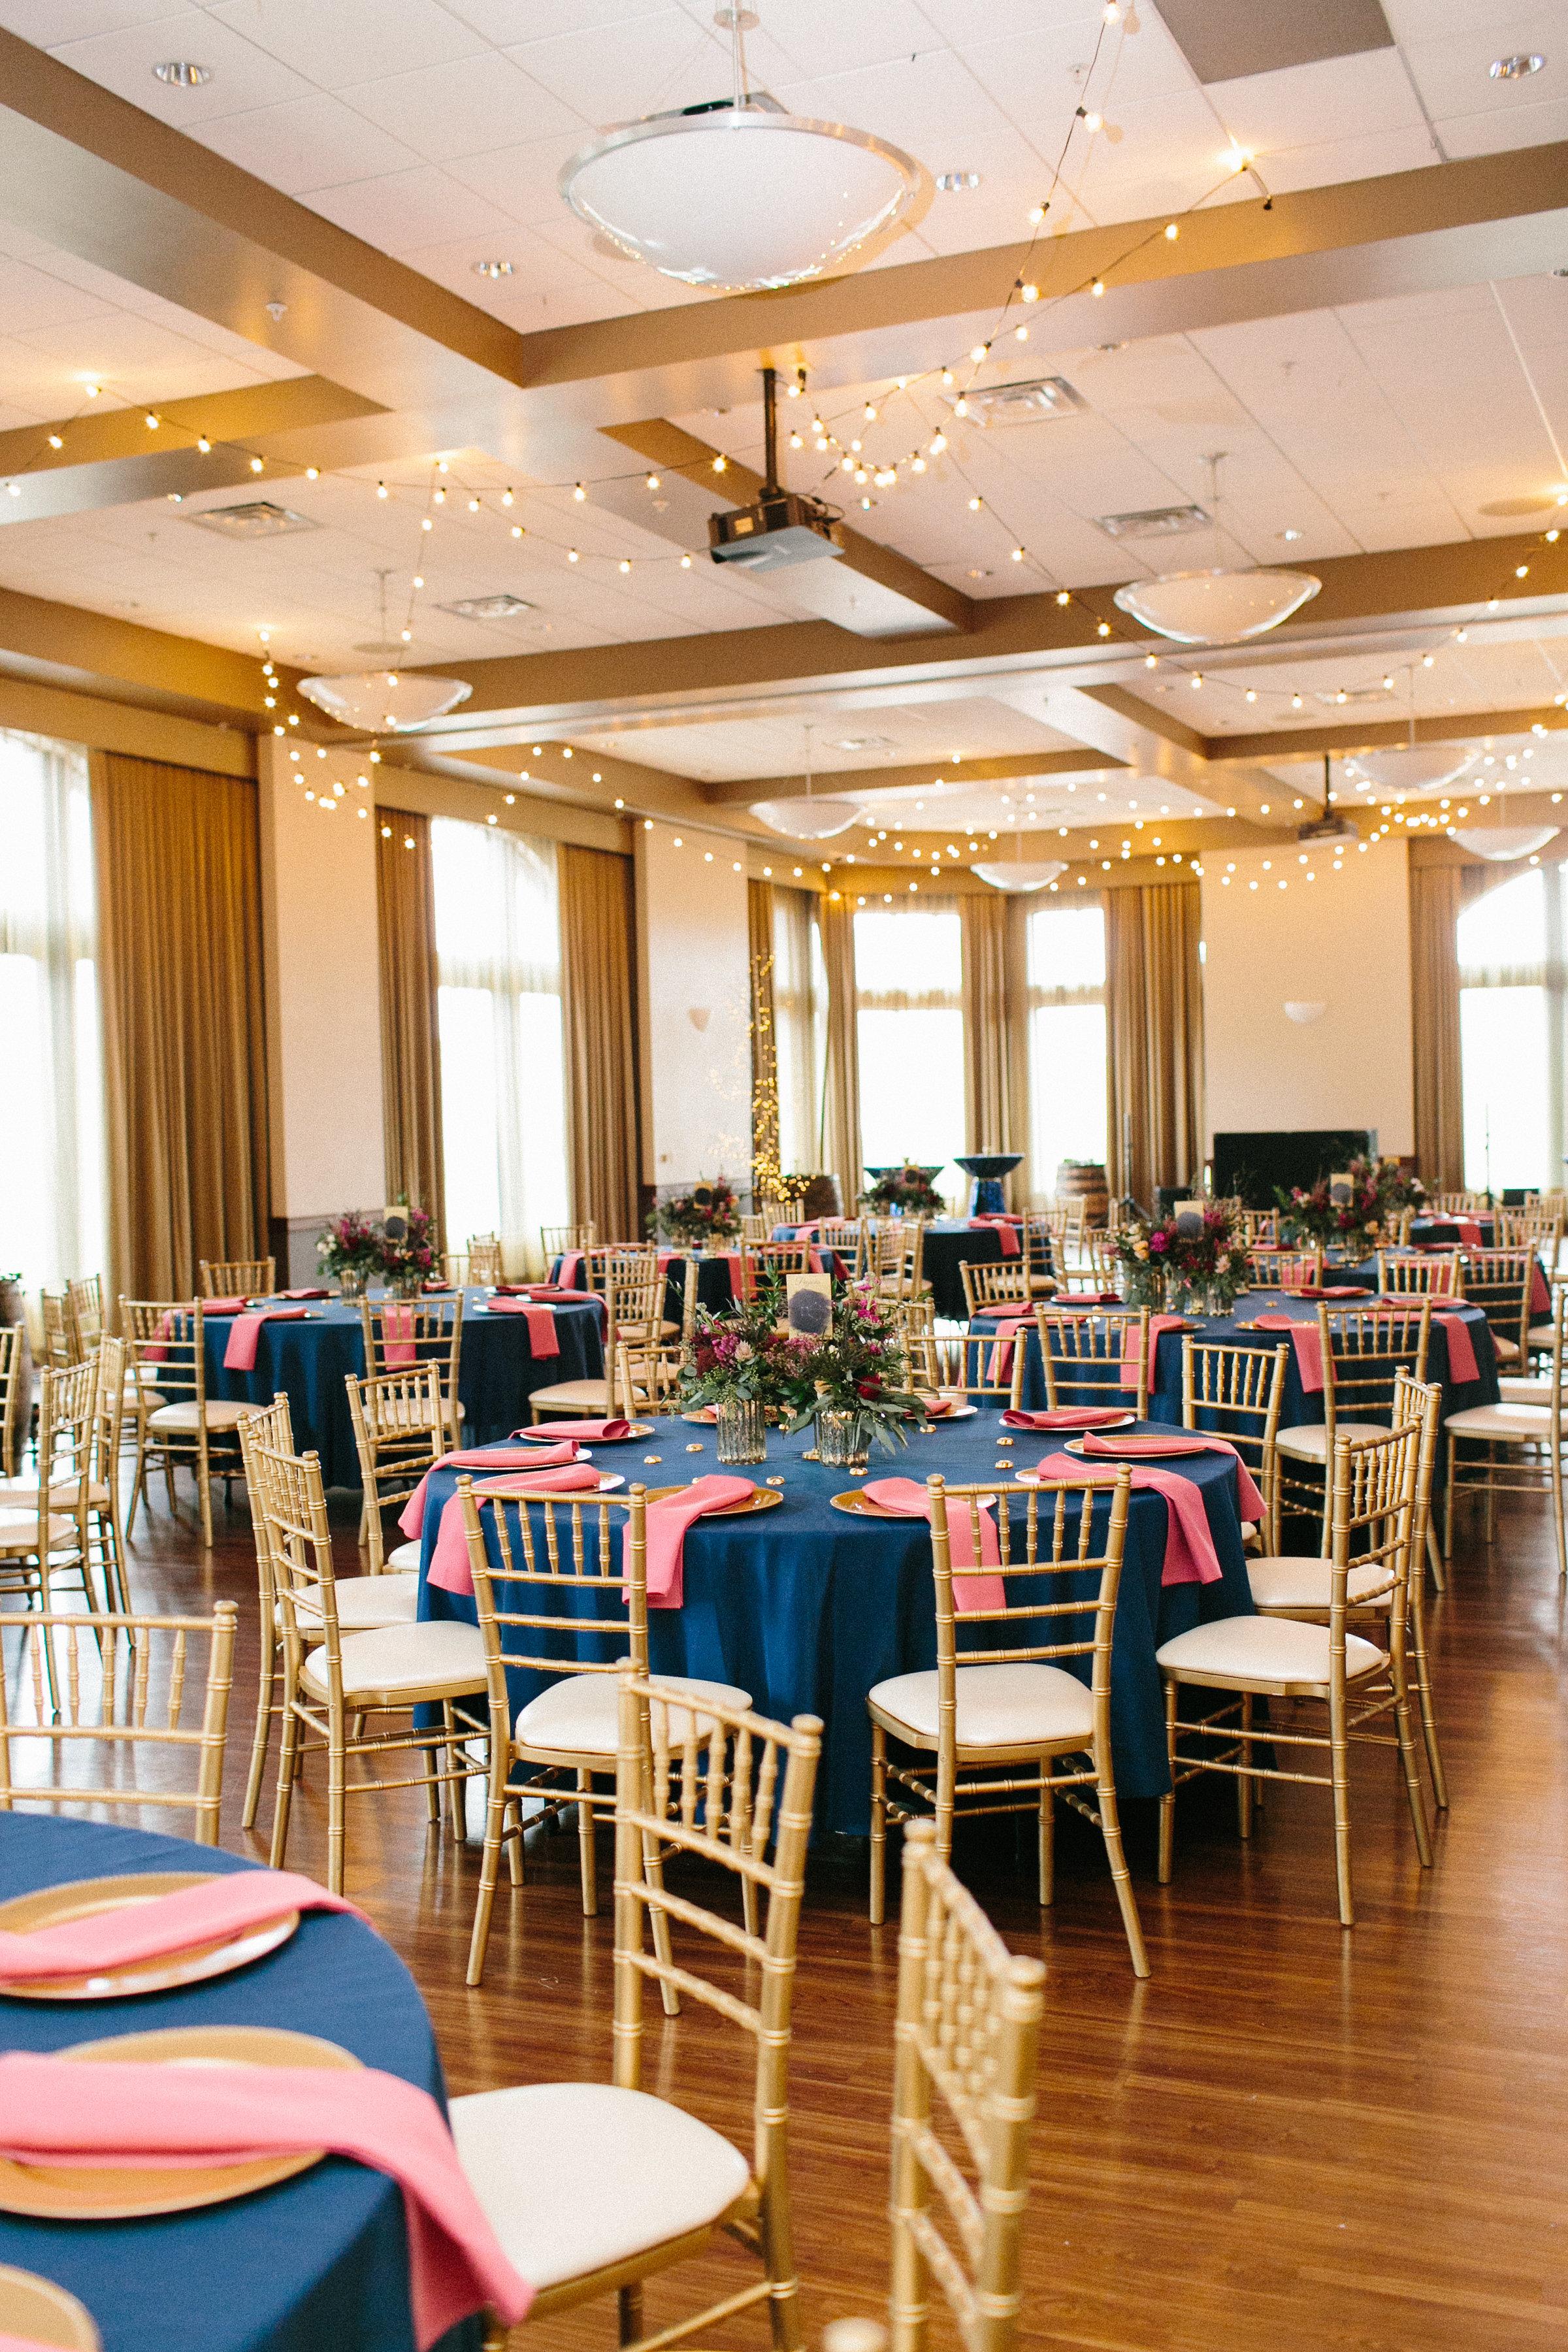 2017_Carly_Milbrath_Jefferson_Street_Inn_Wedding_Wausau_WI_001.JPG